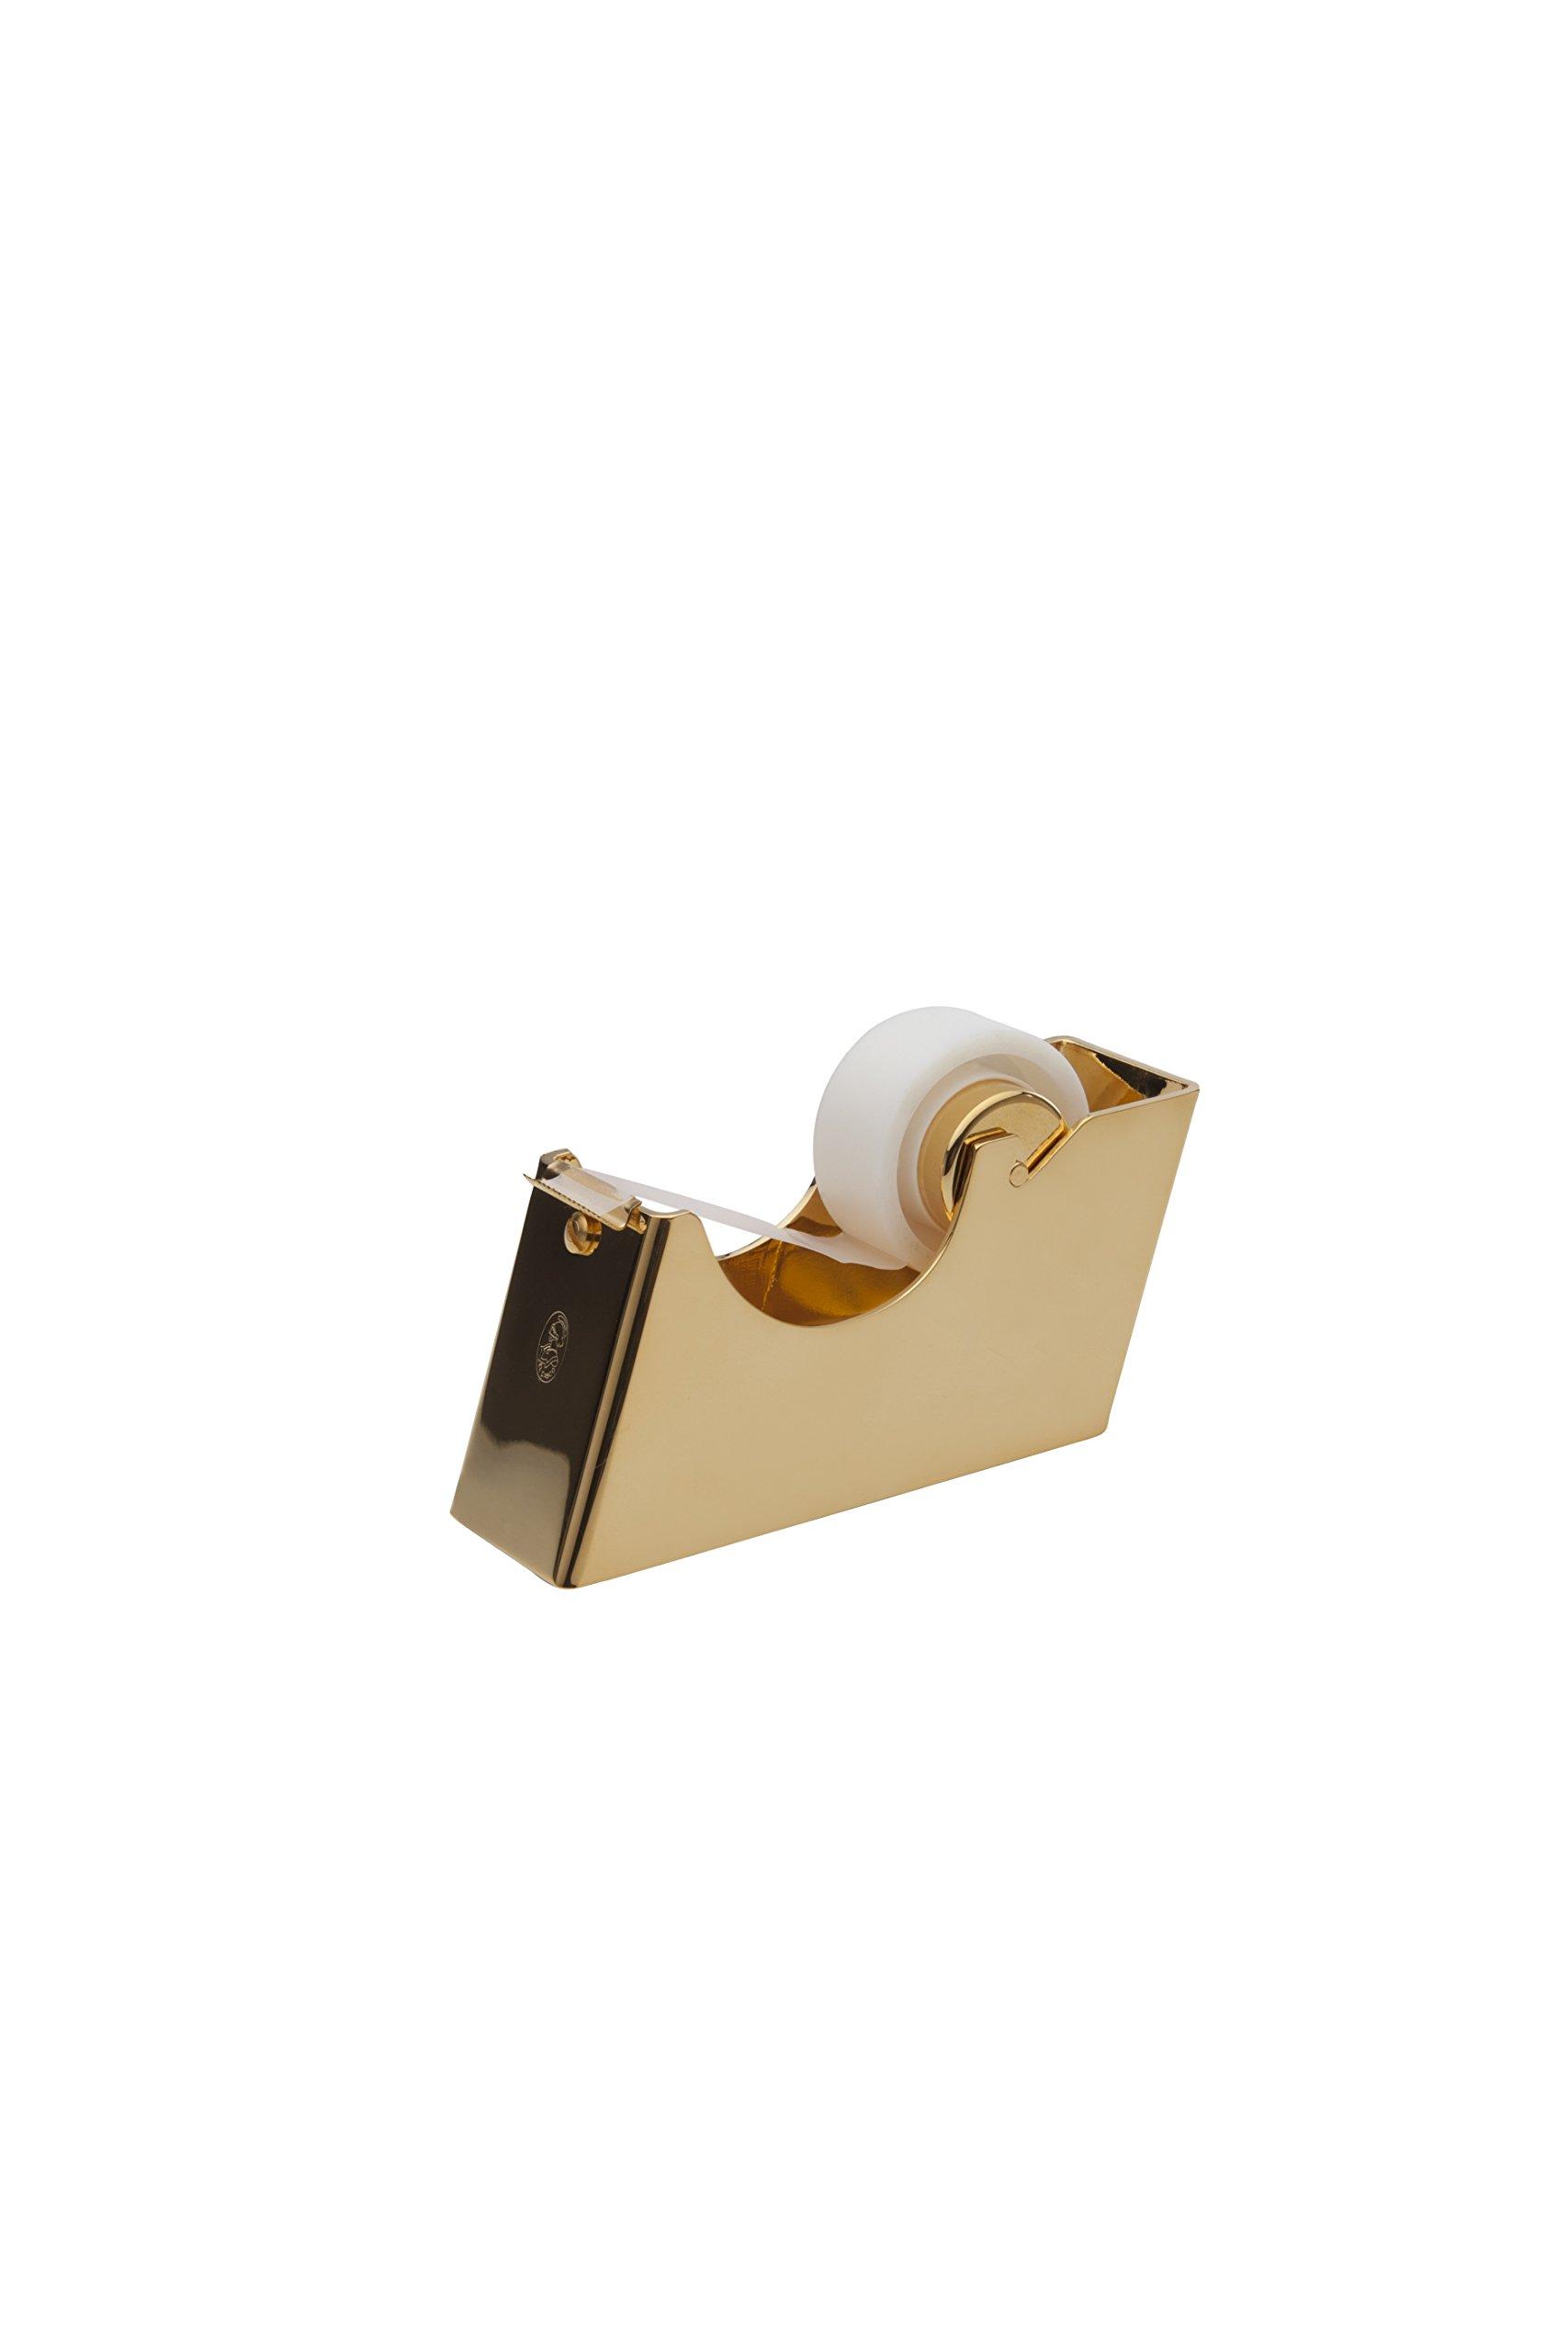 El Casco 23kt Gold Plated Tape Dispenser M-800L